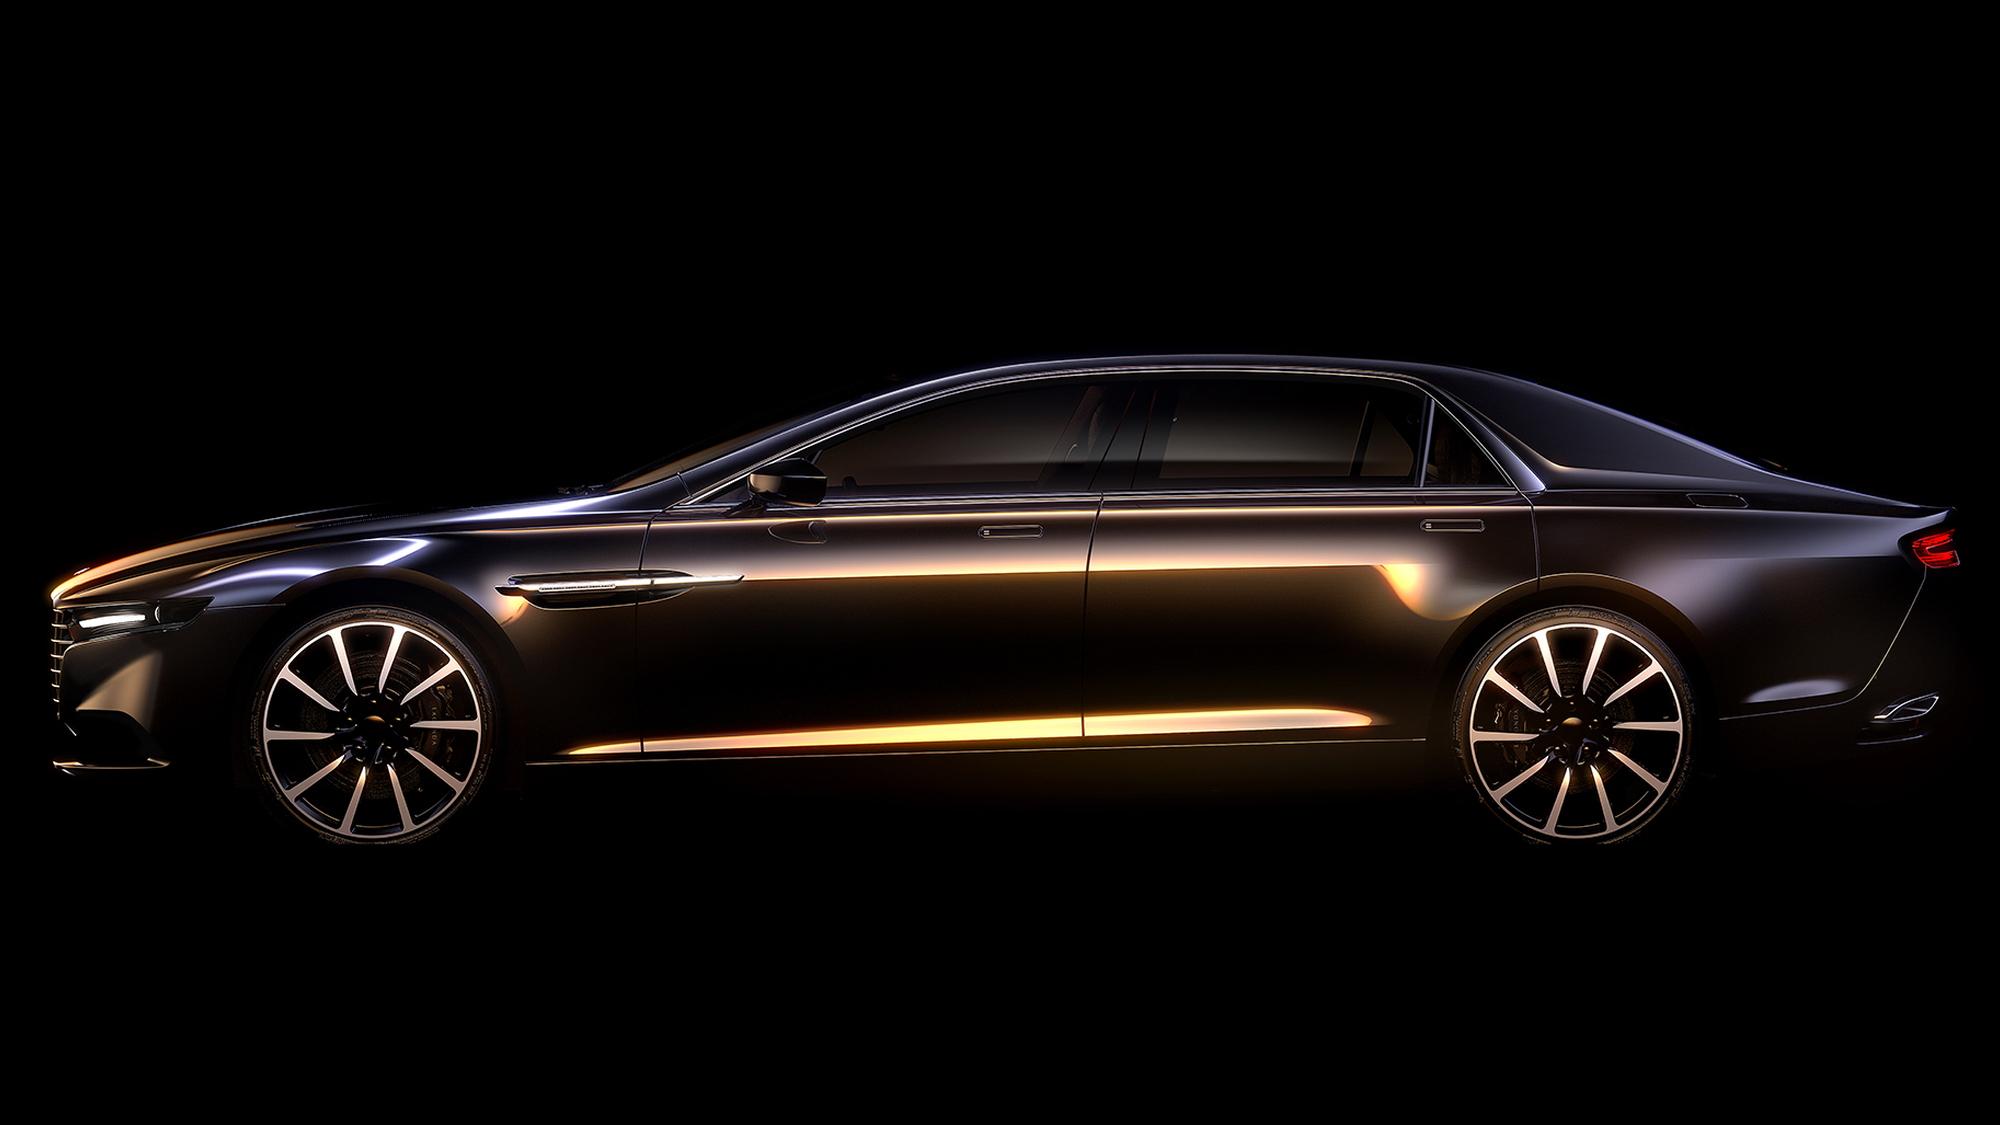 New limited-edition Aston Martin Lagonda sedan